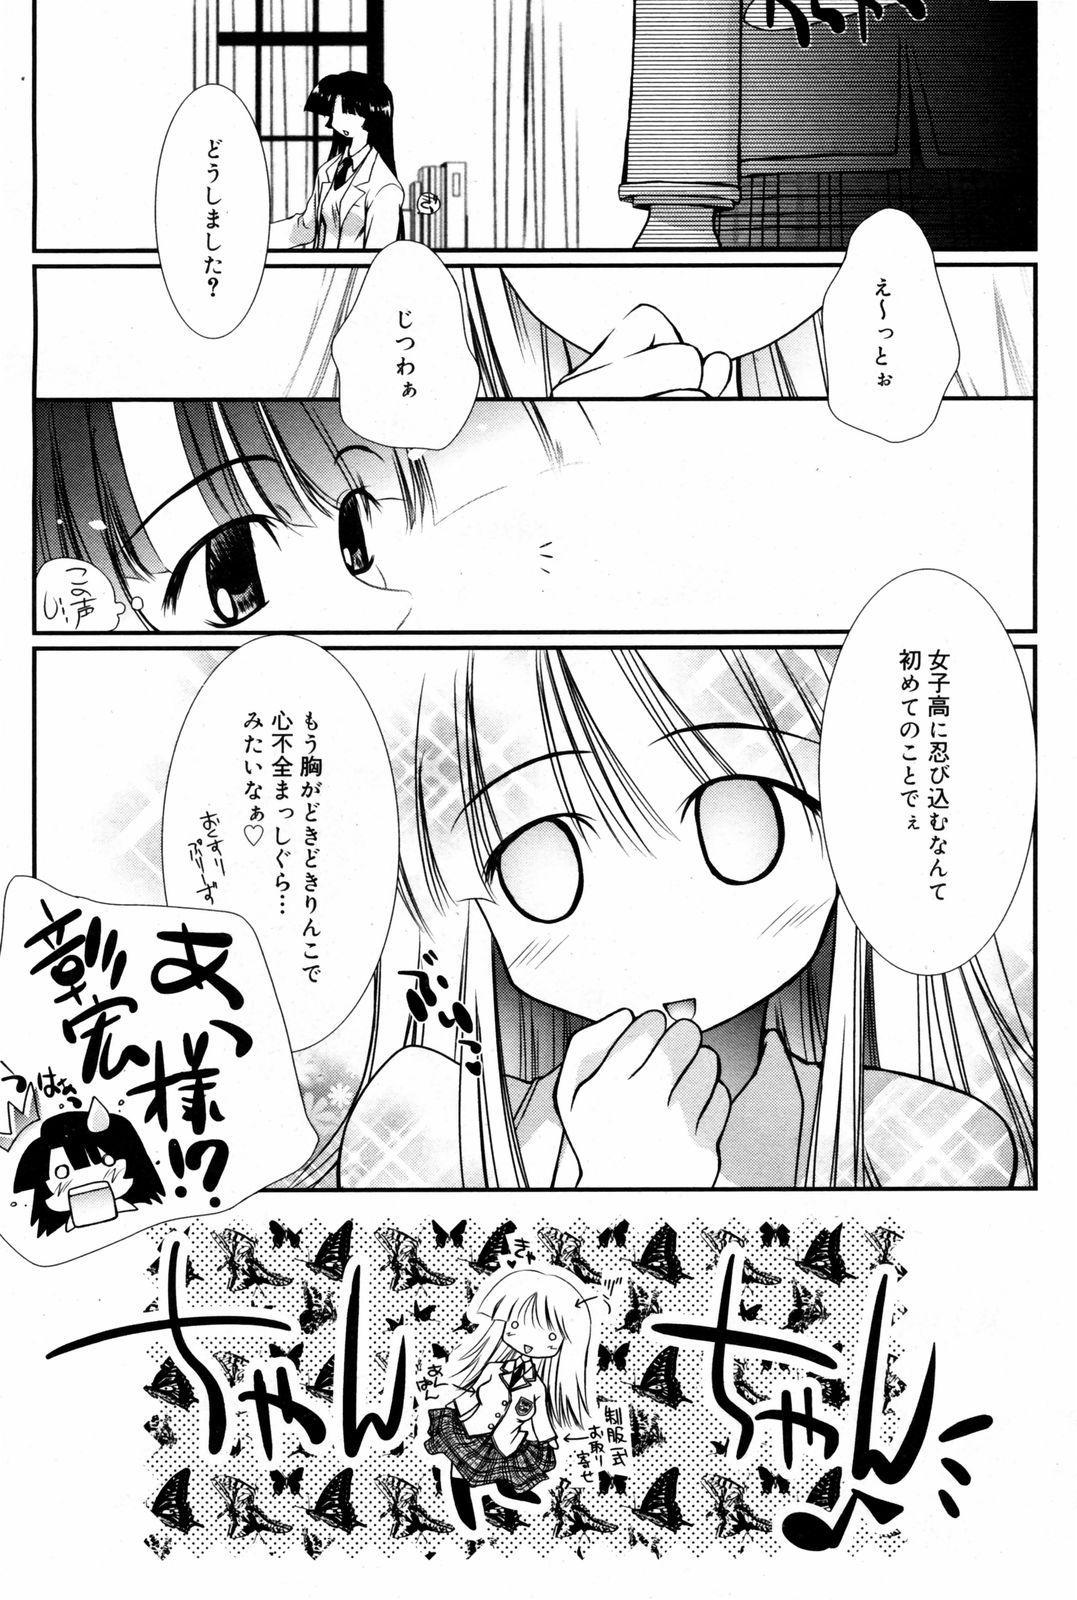 Manga Bangaichi 2008-03 58